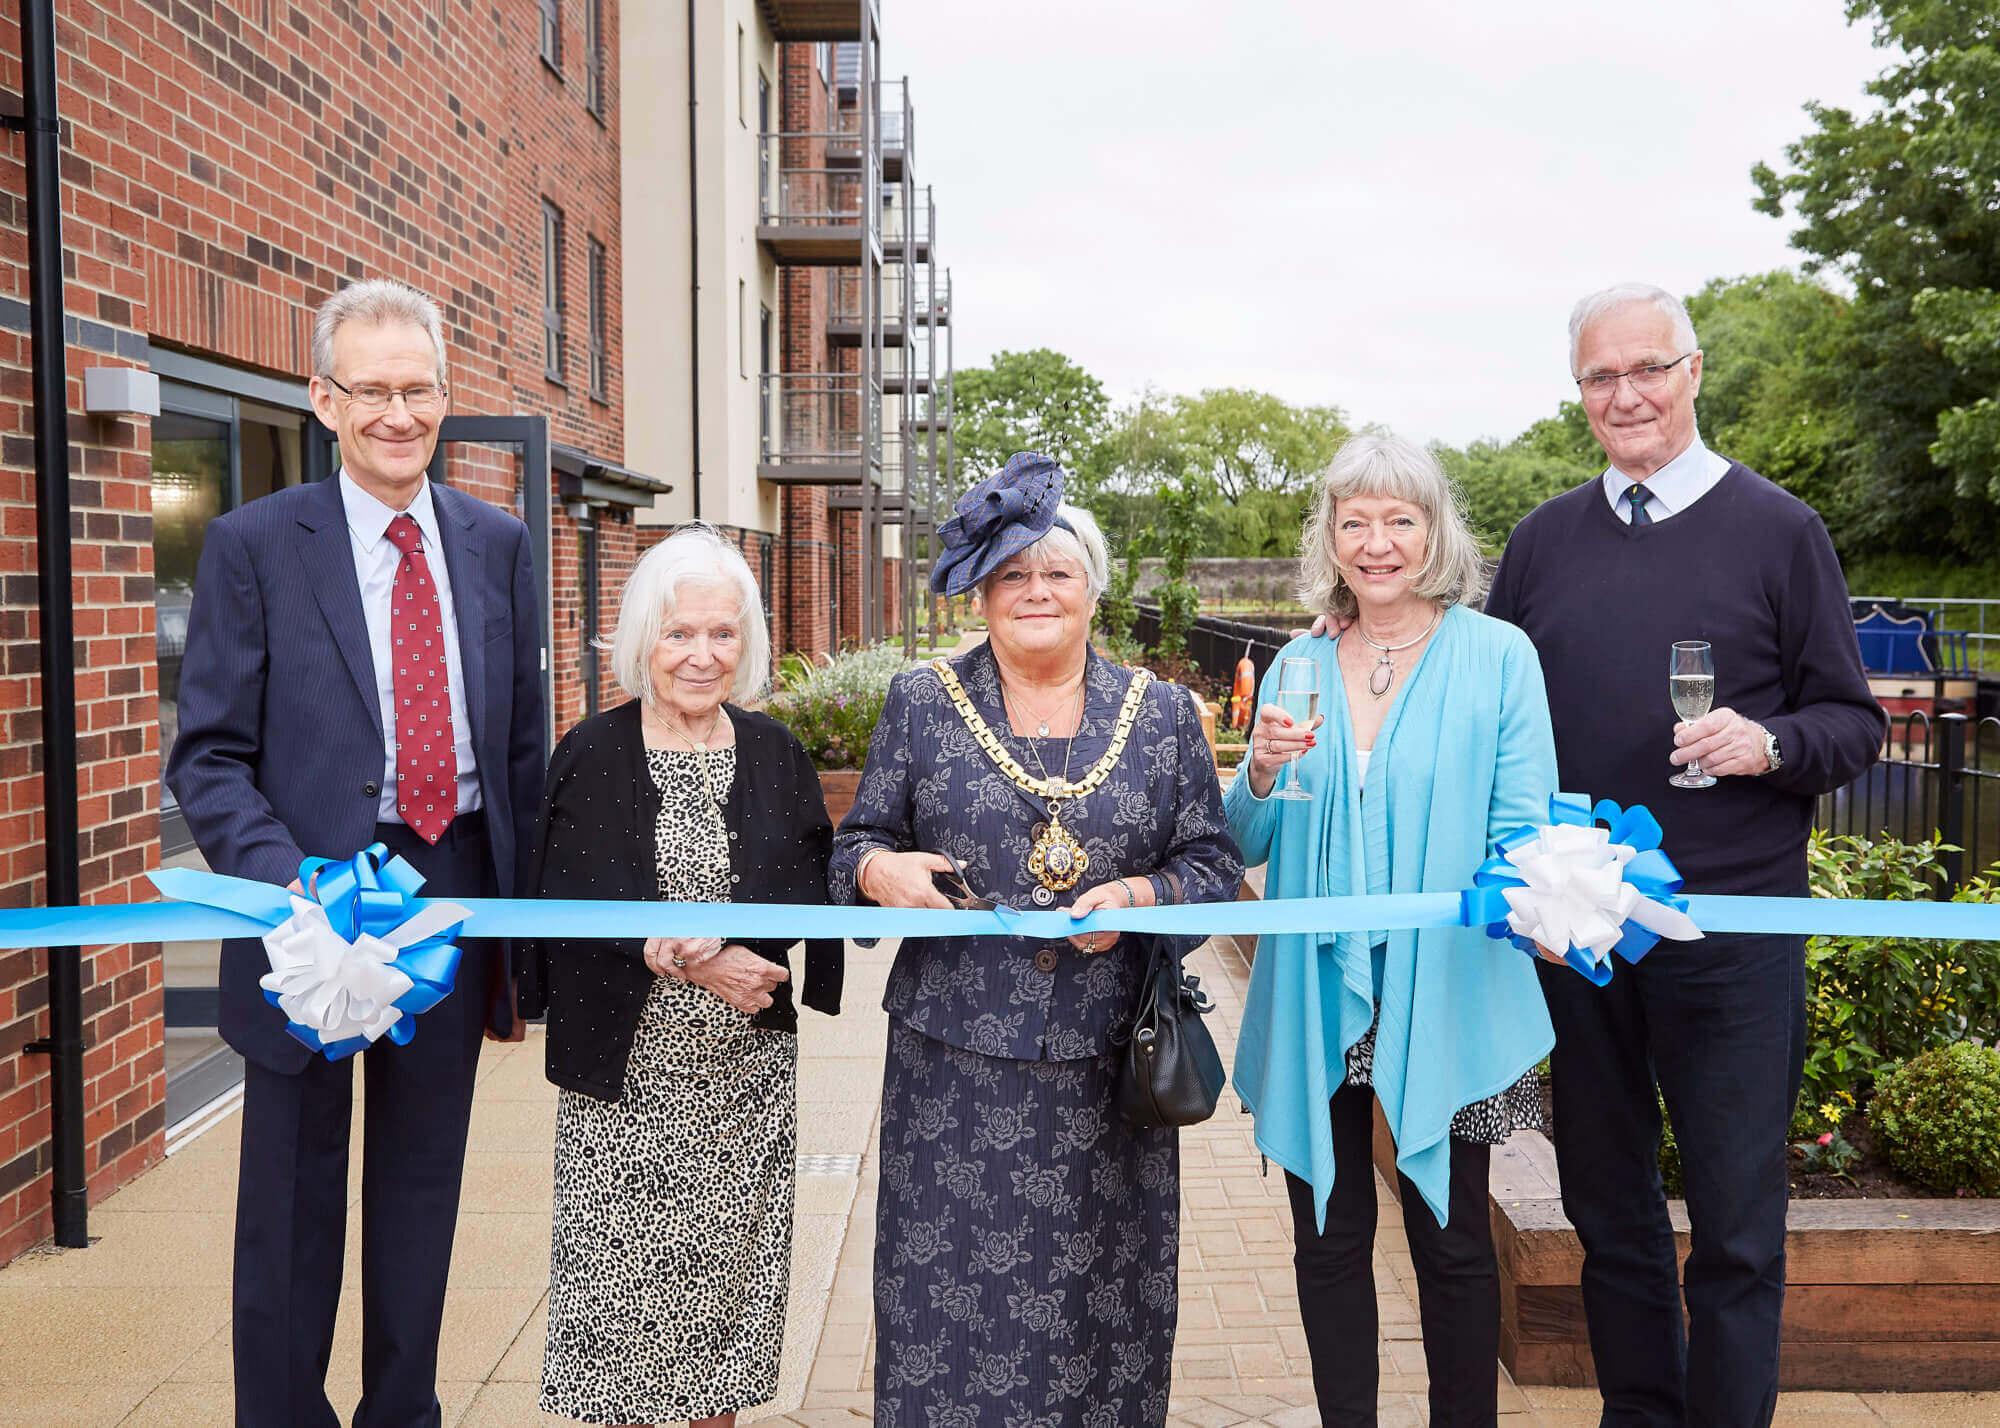 Macclesfield Mayor Opening